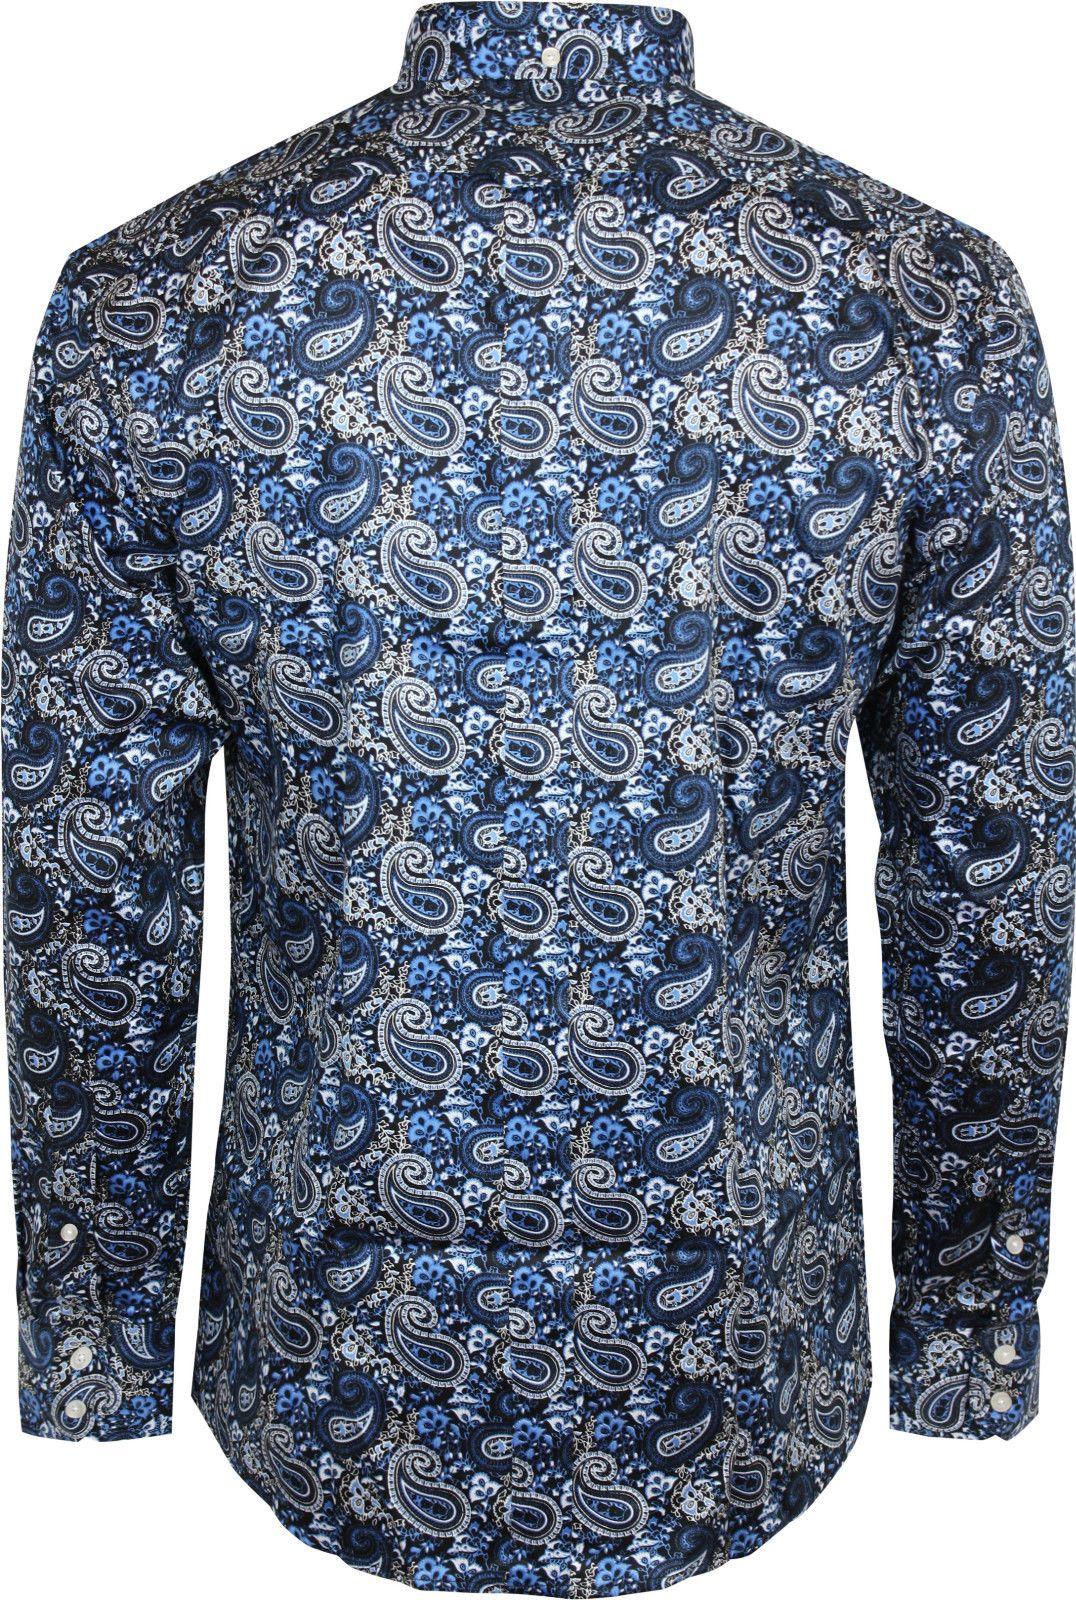 Paisley Shirt Mens Vintage